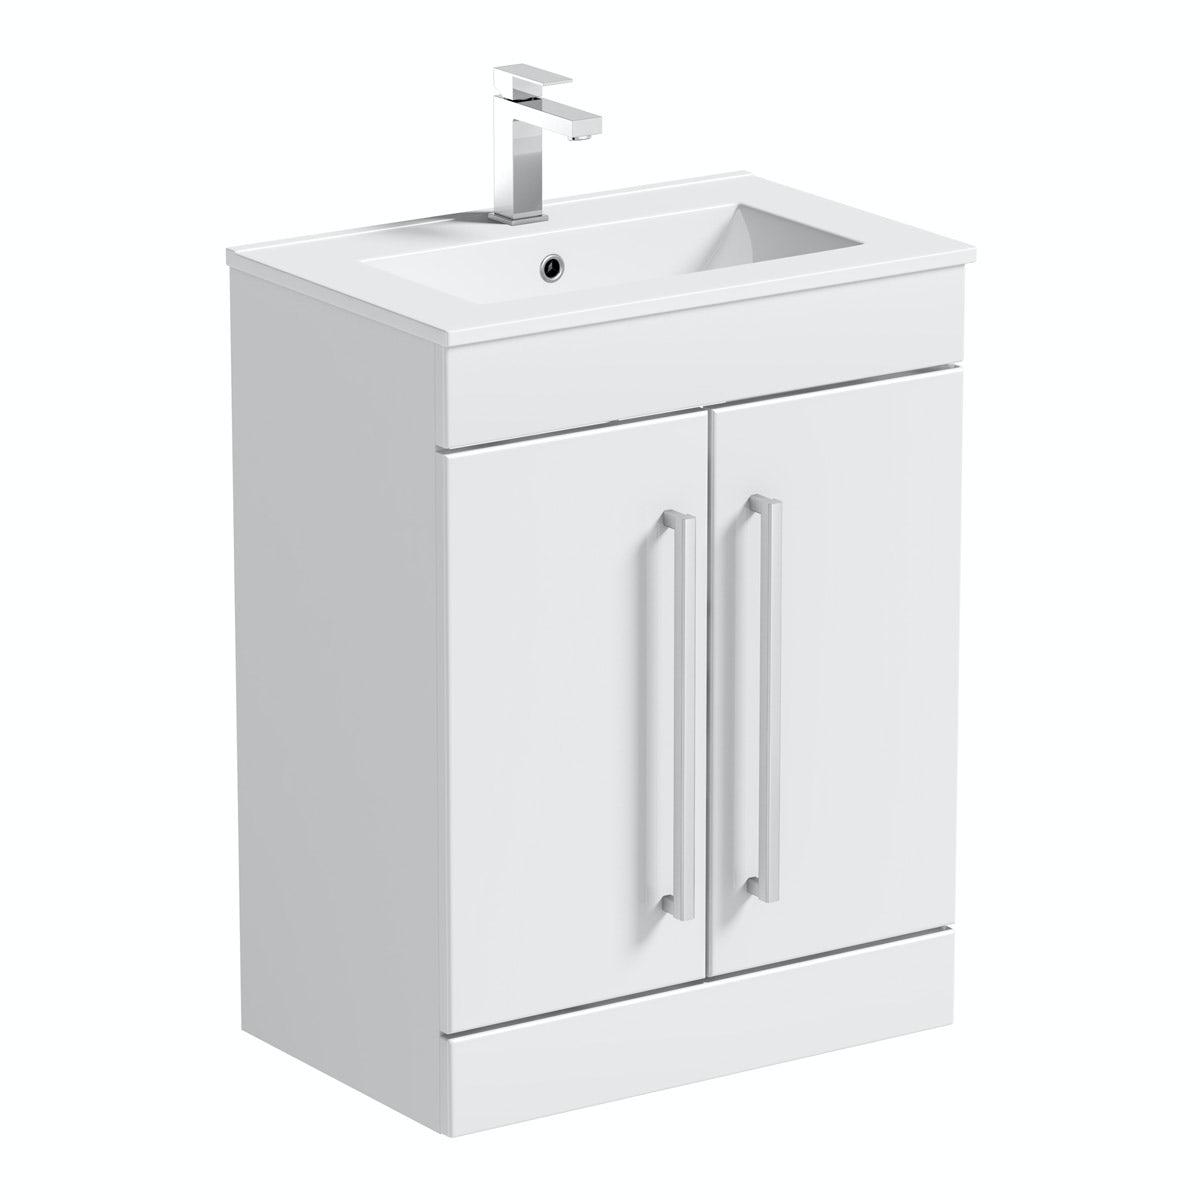 Orchard Derwent white vanity door unit and basin 600mm